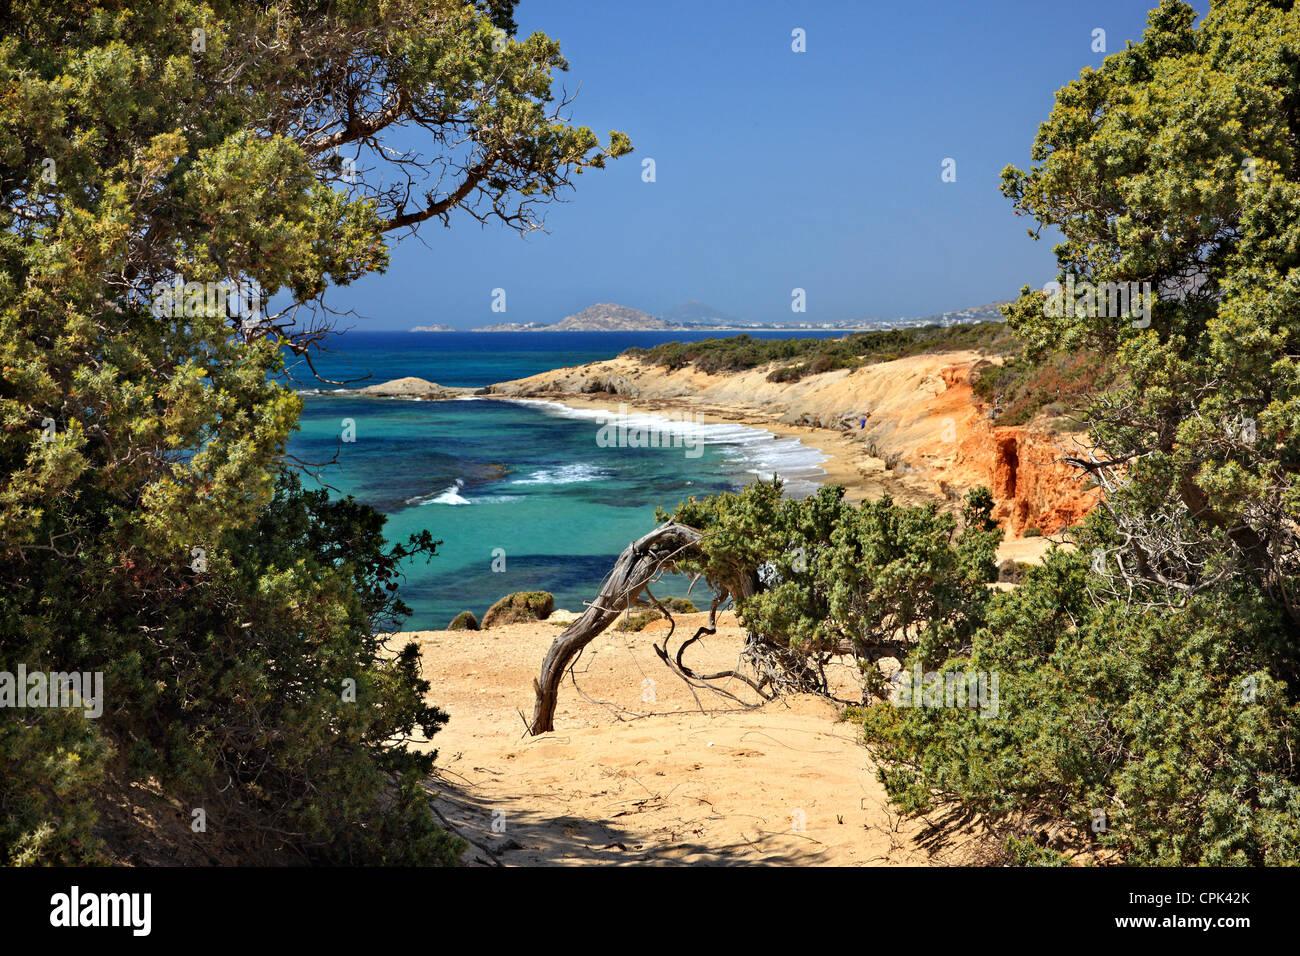 """Passage"" to Alyko beach, at Kedrodasos (""Cedar forest""), Naxos island, Cyclades, GreeceStock Photo"